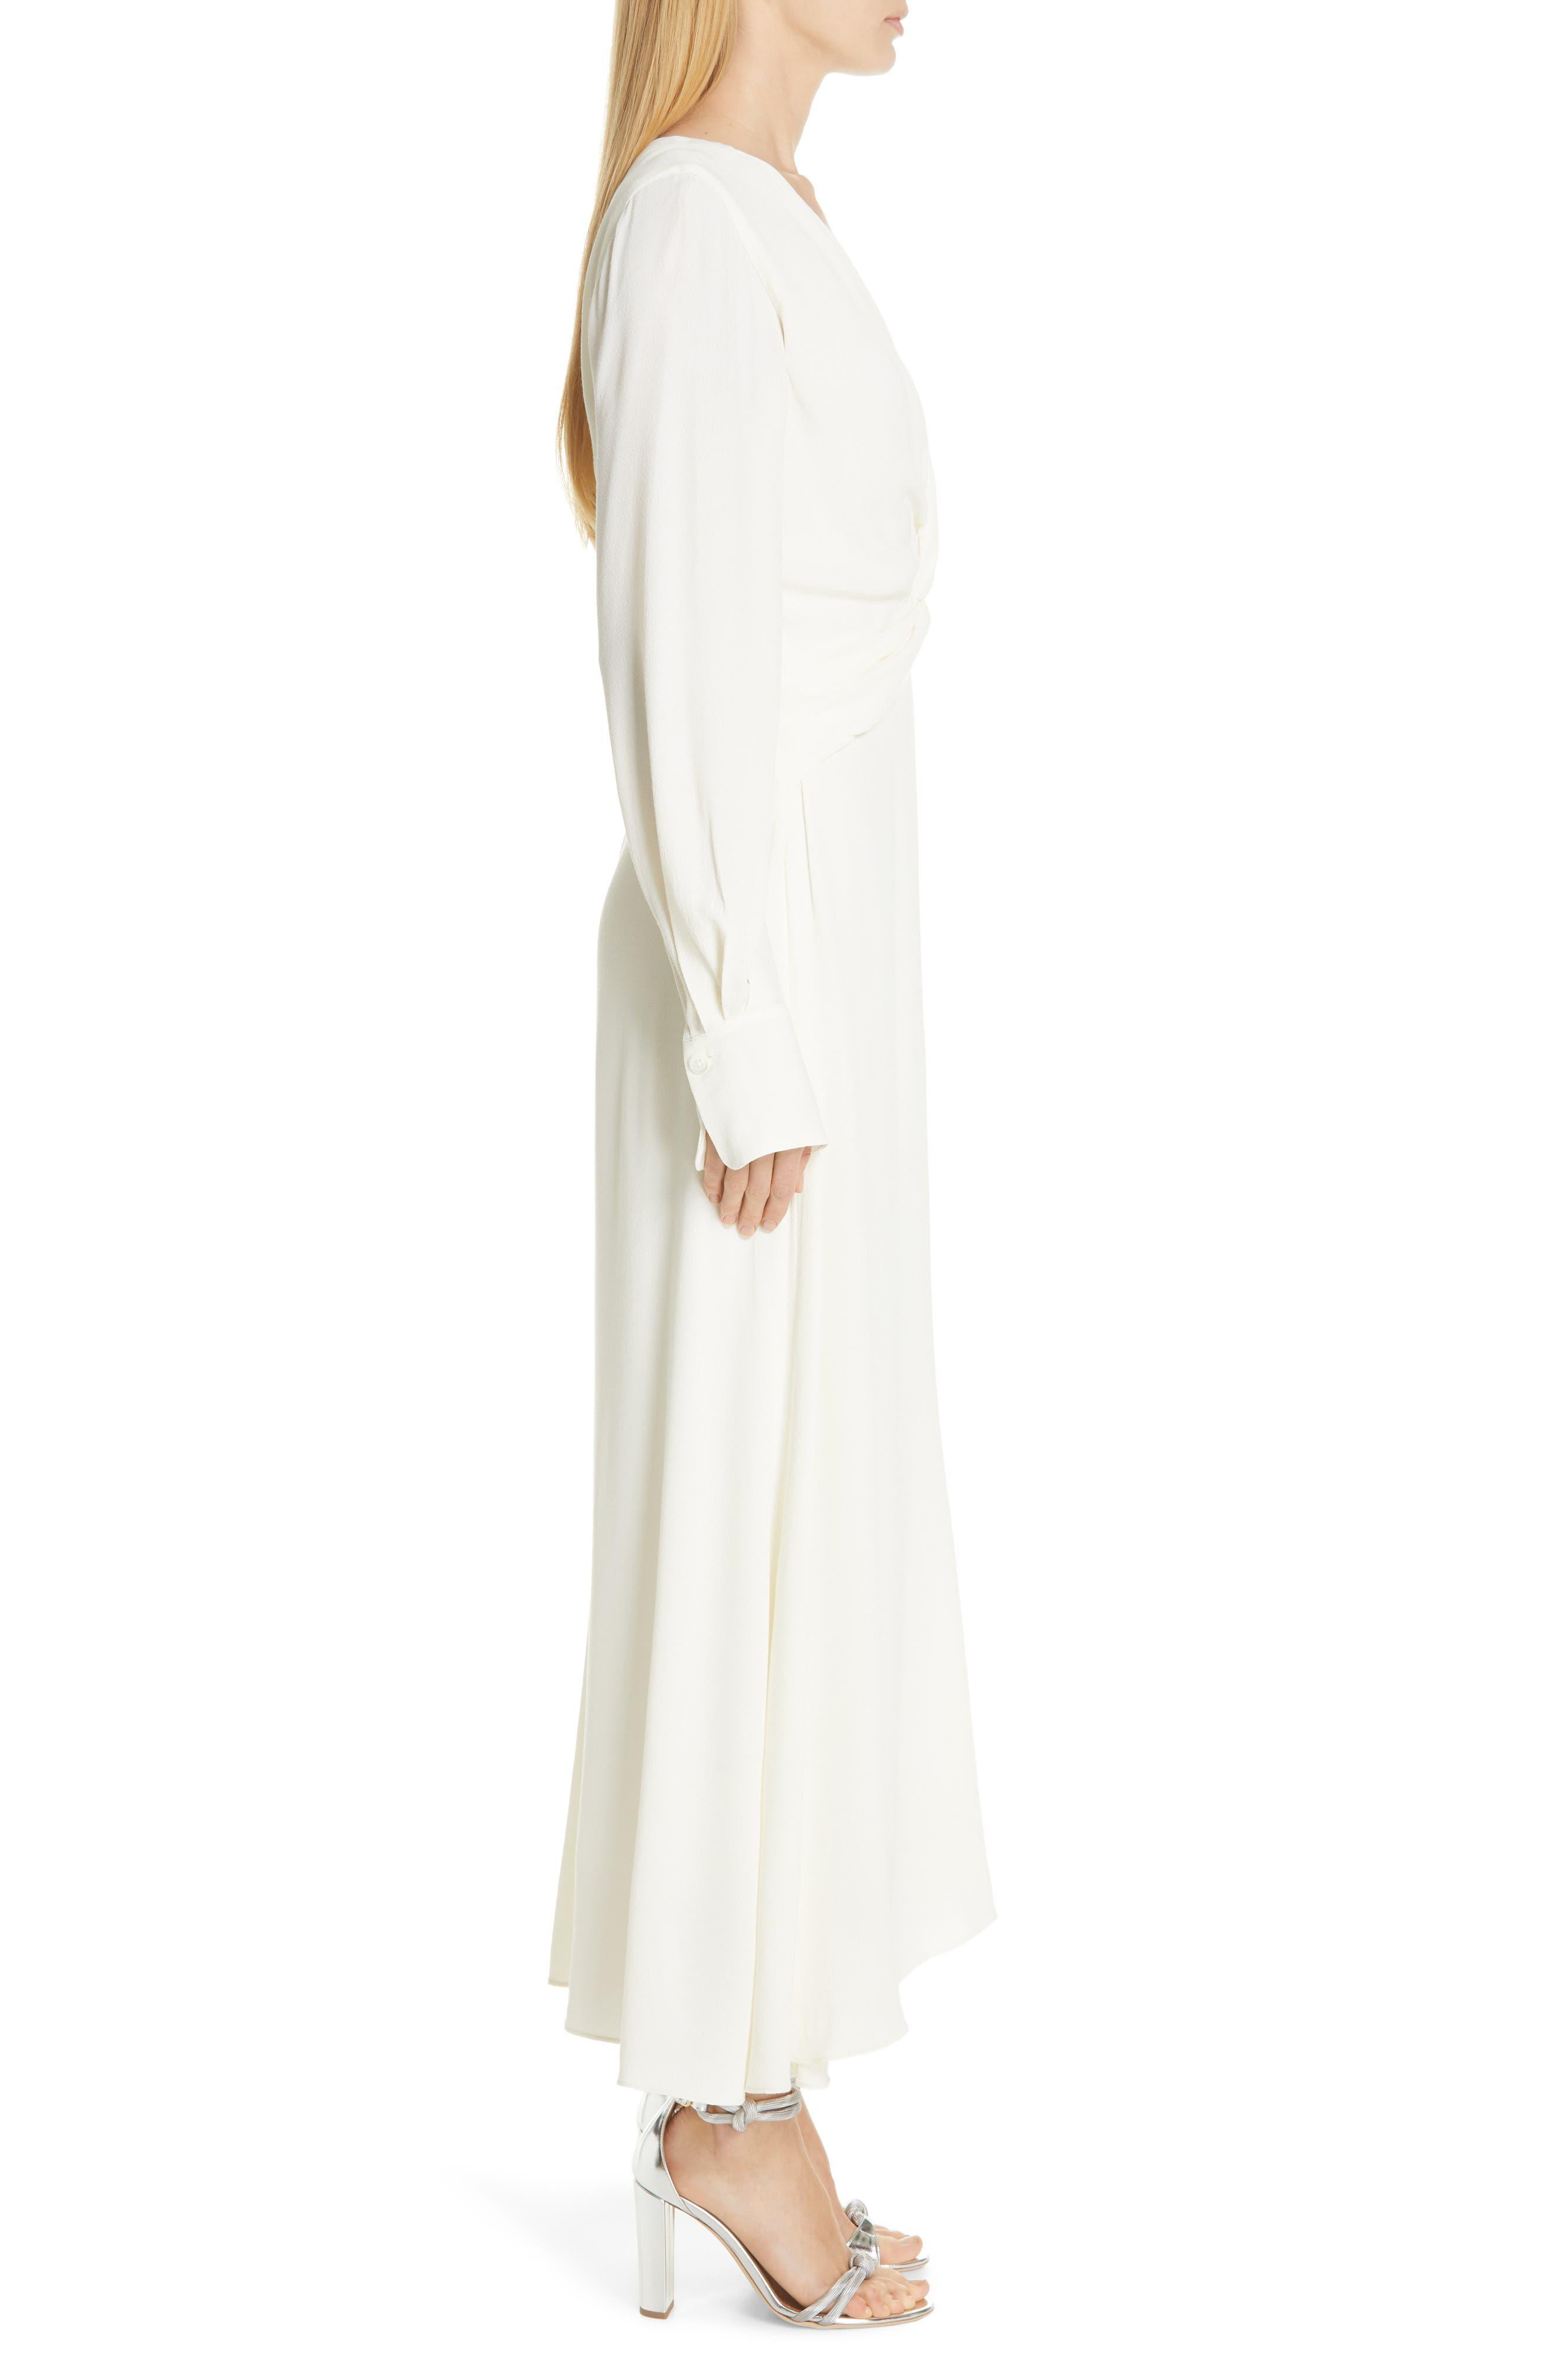 EQUIPMENT, Faun Twist Front Dress, Alternate thumbnail 3, color, NATURE WHITE